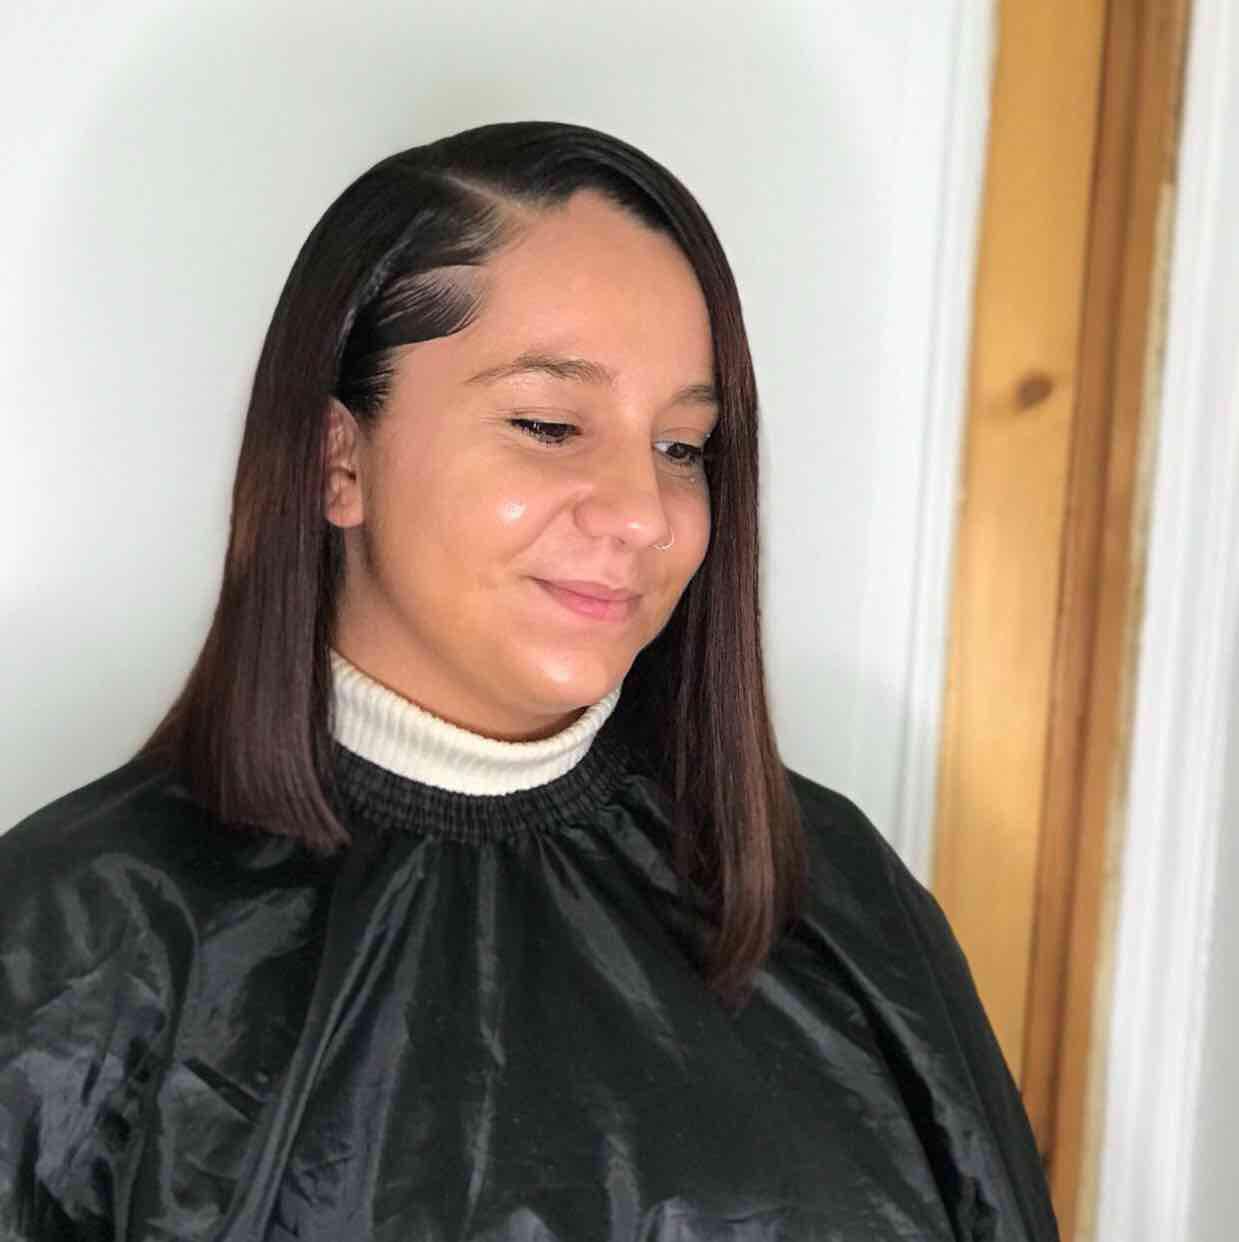 salon de coiffure afro tresse tresses box braids crochet braids vanilles tissages paris 75 77 78 91 92 93 94 95 FEFUQBSD